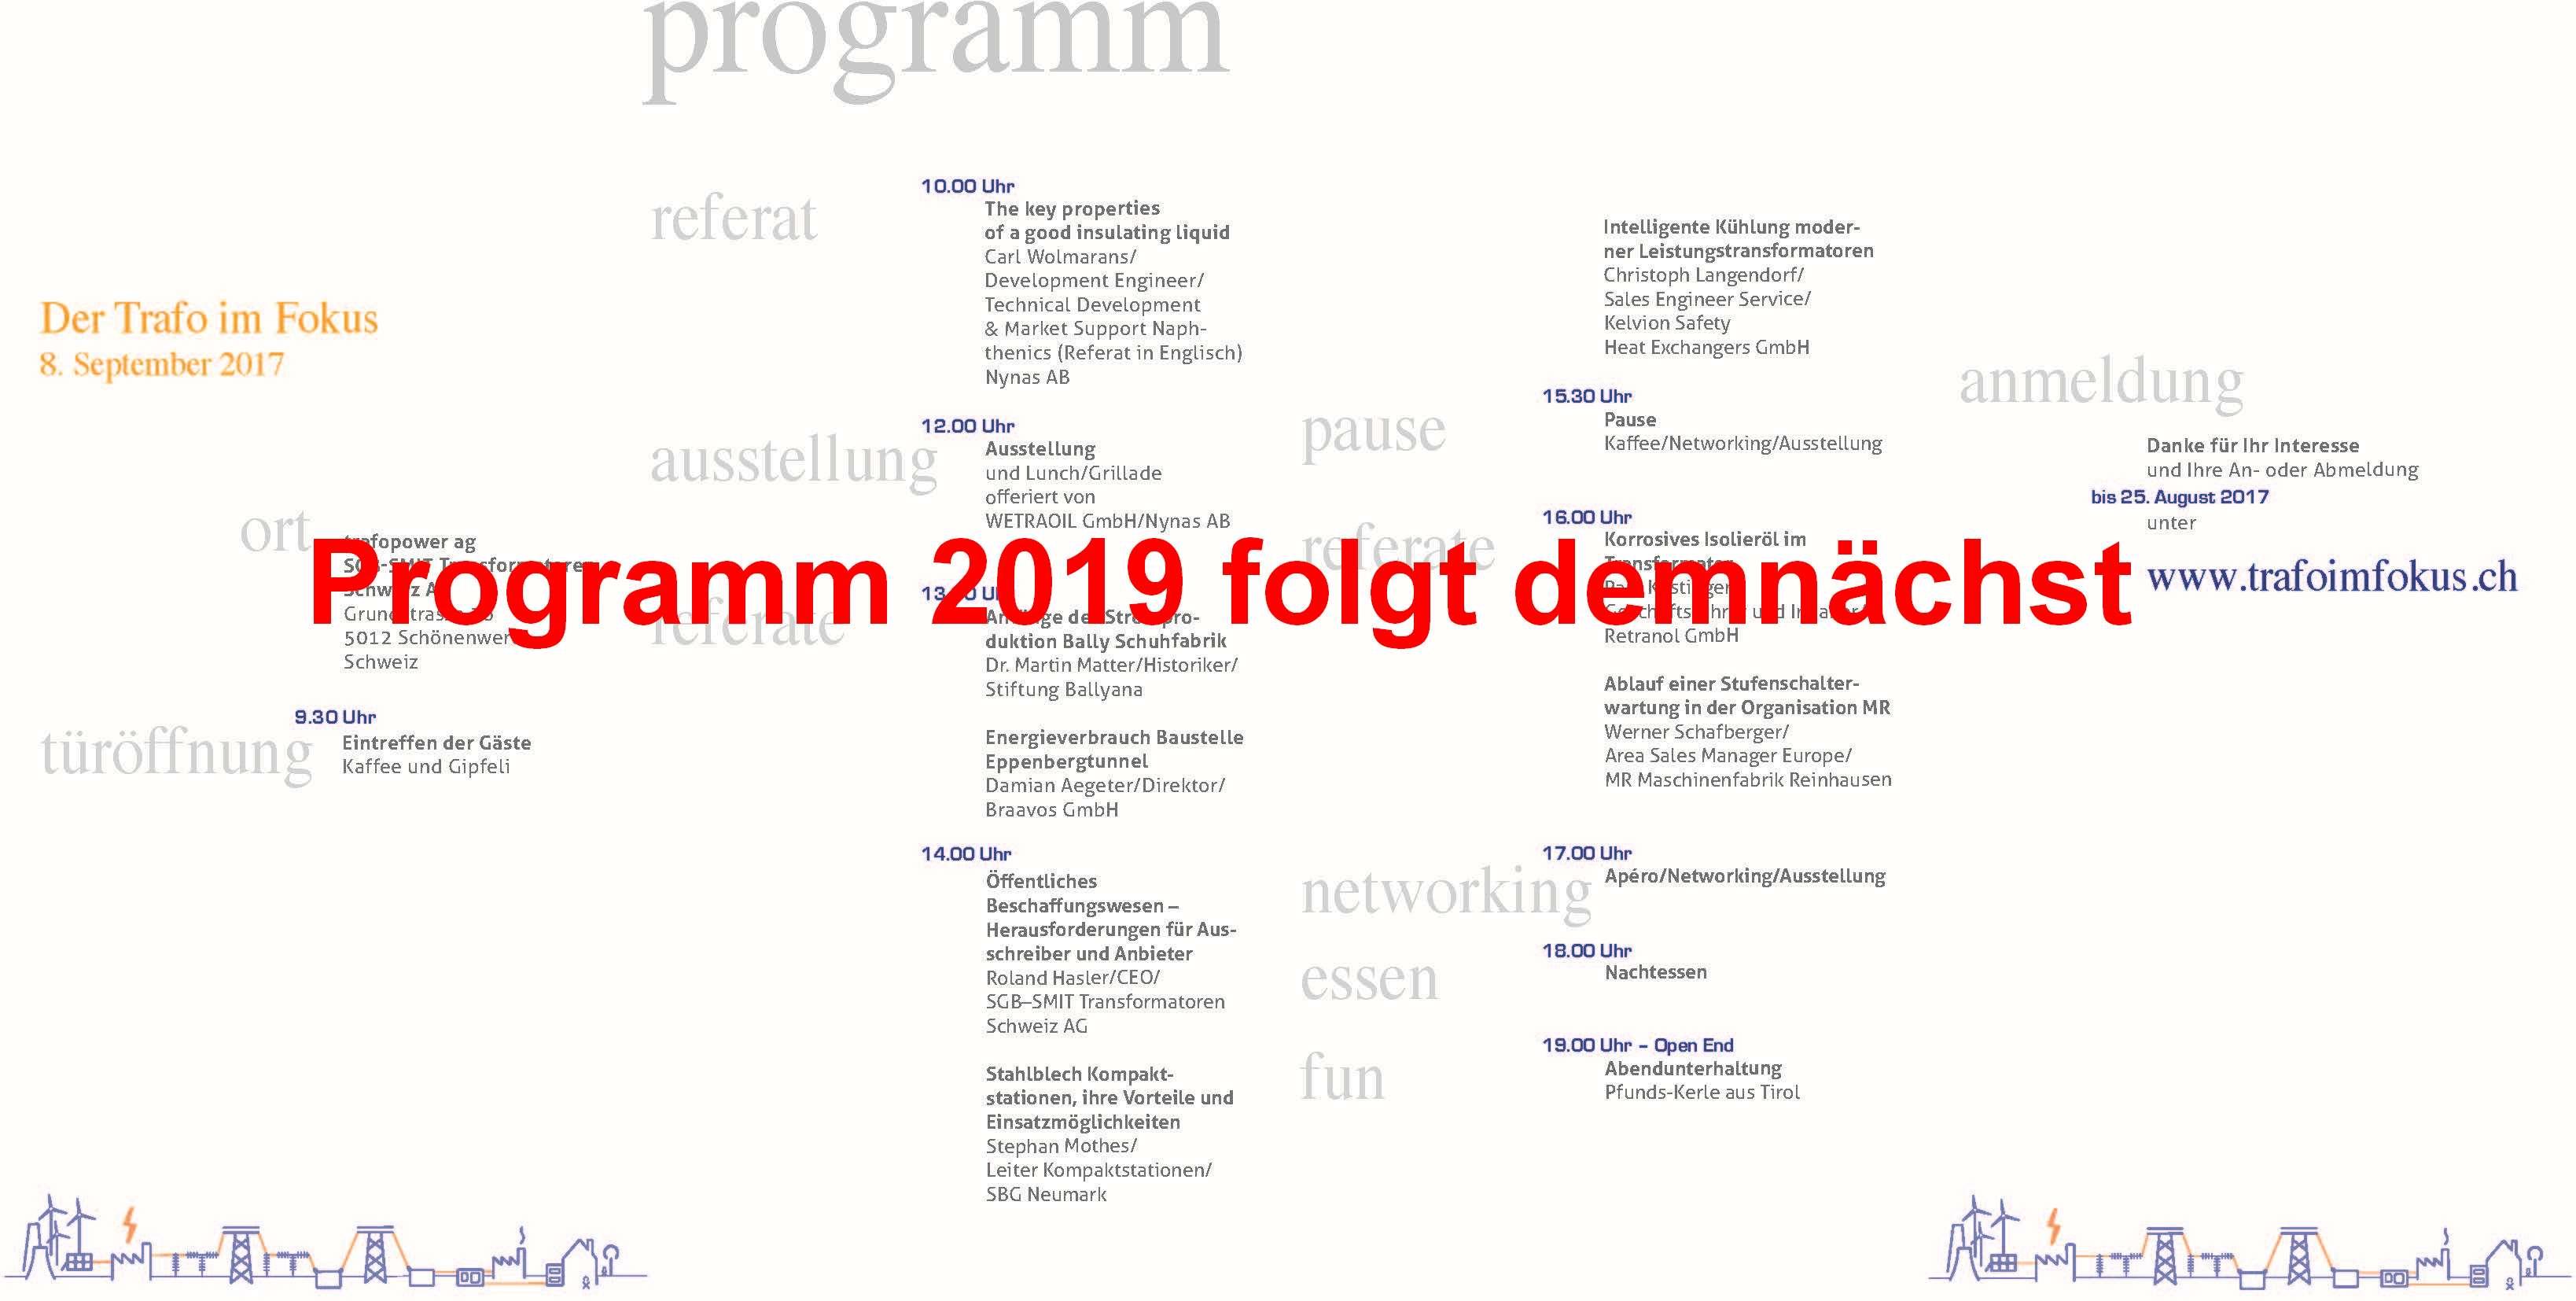 Programm_Trafo_im_Fokus